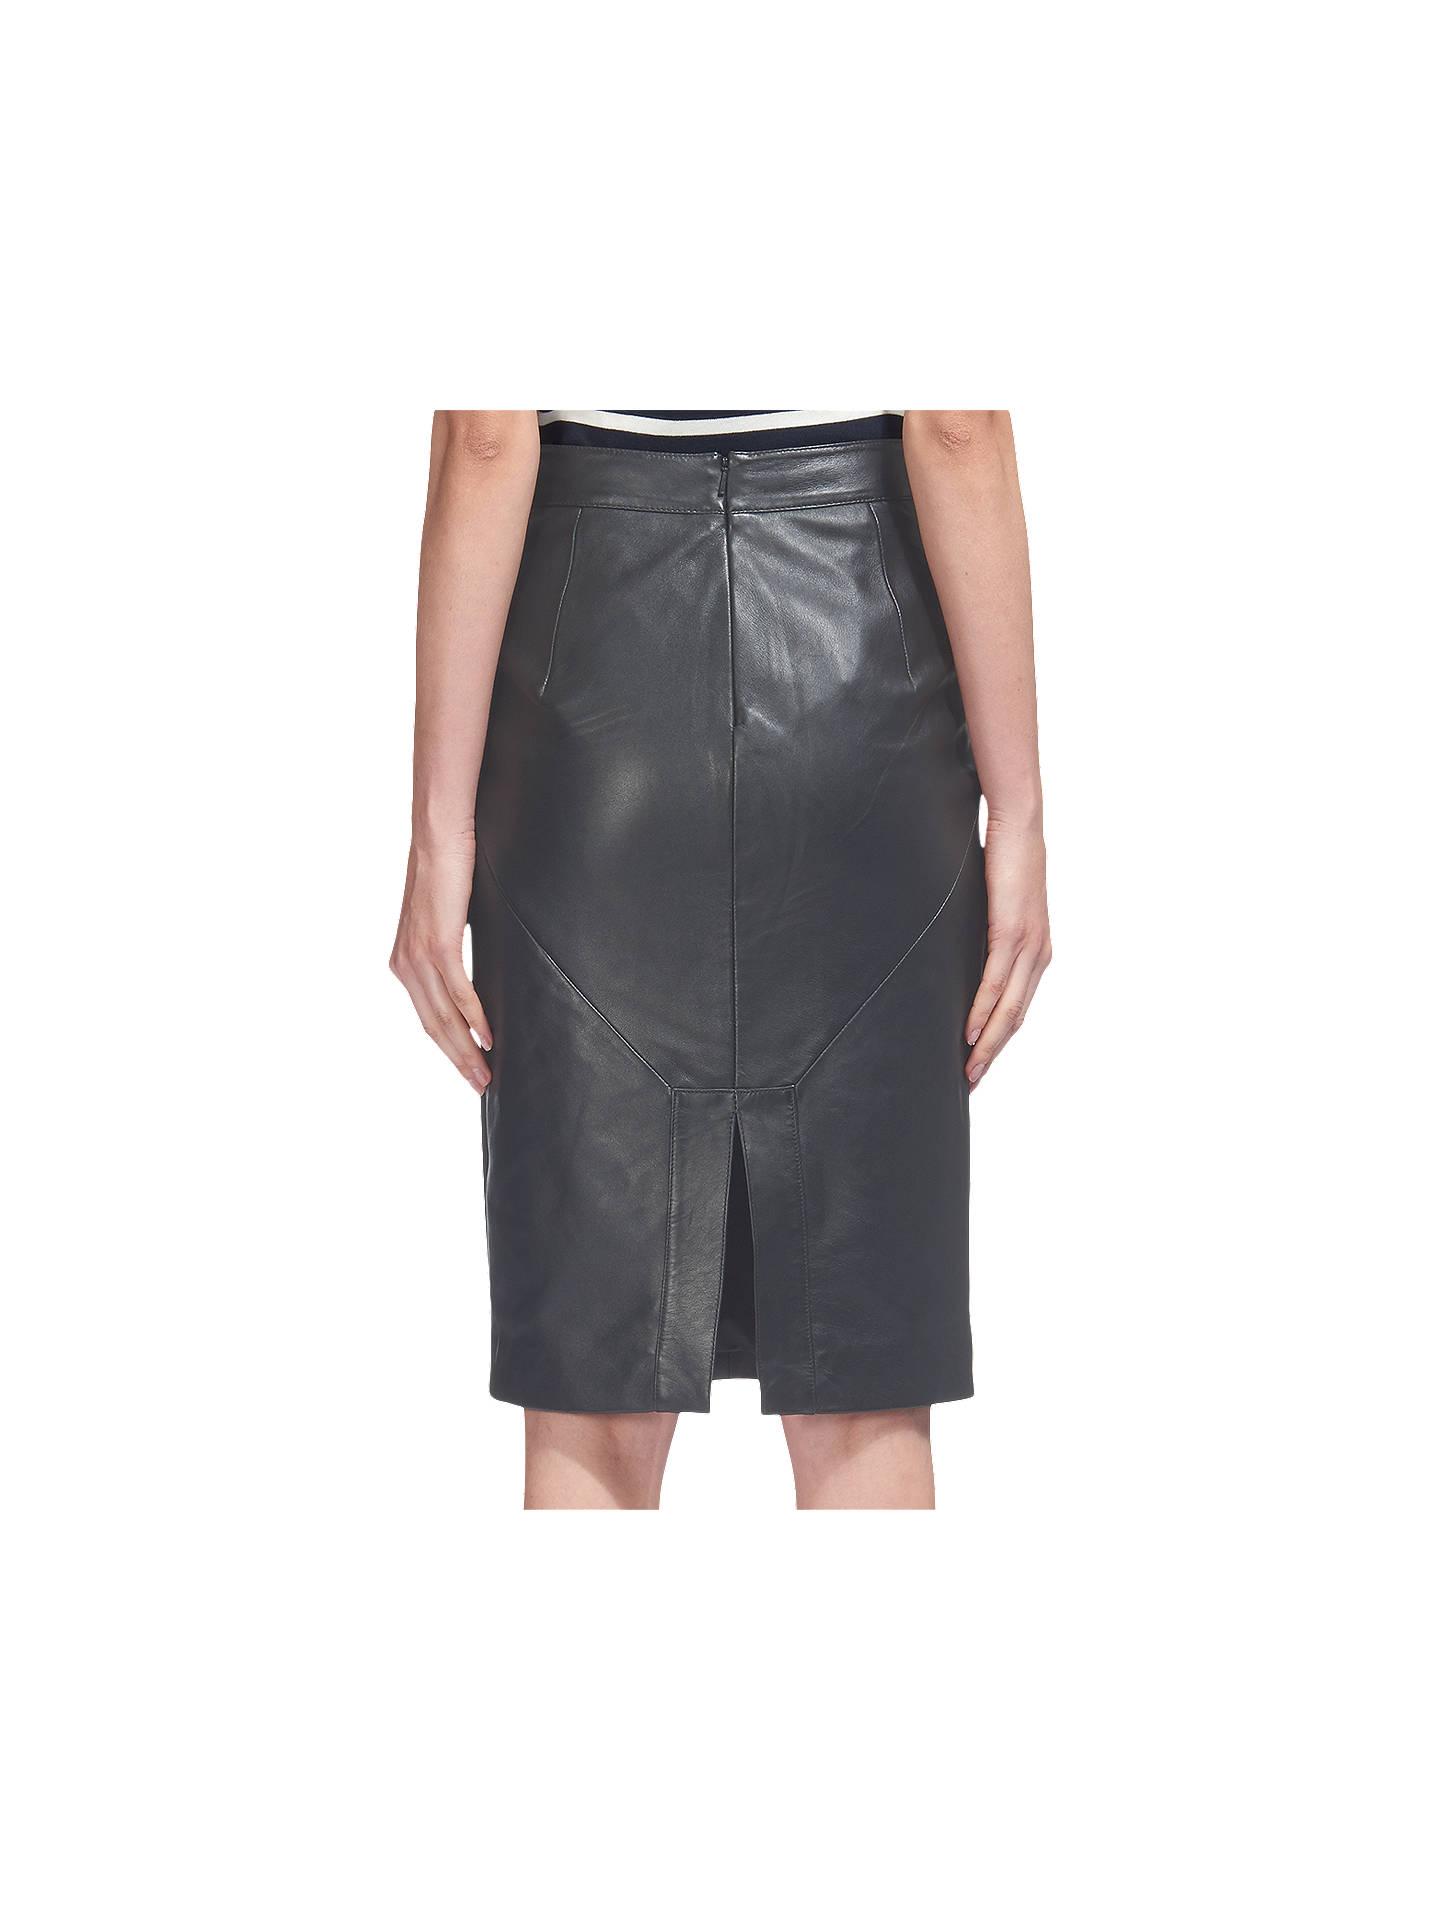 a2761252fe ... Buy Whistles Kel Leather Pencil Skirt, Black, 6 Online at johnlewis.com  ...